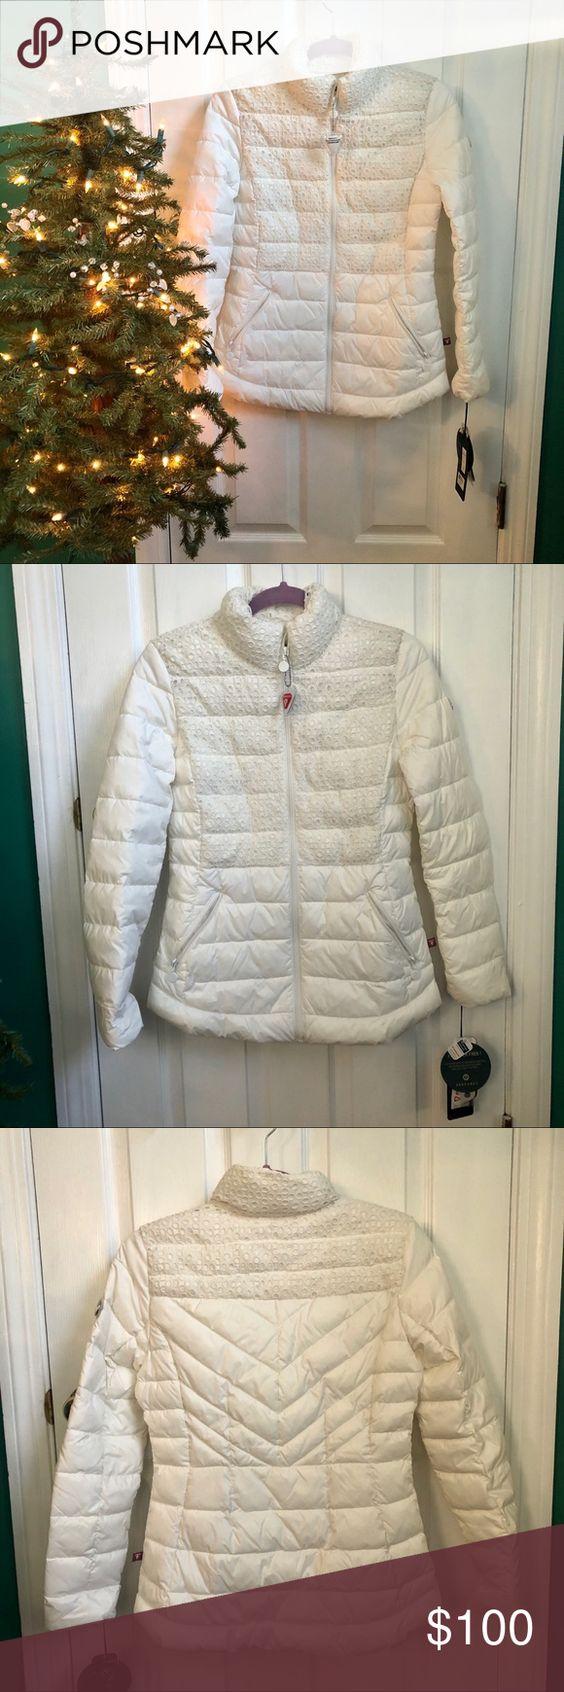 Bernardo Puffer Jacket Xs White Primaloft Puffer Jackets Clothes Design Jackets [ 1692 x 564 Pixel ]